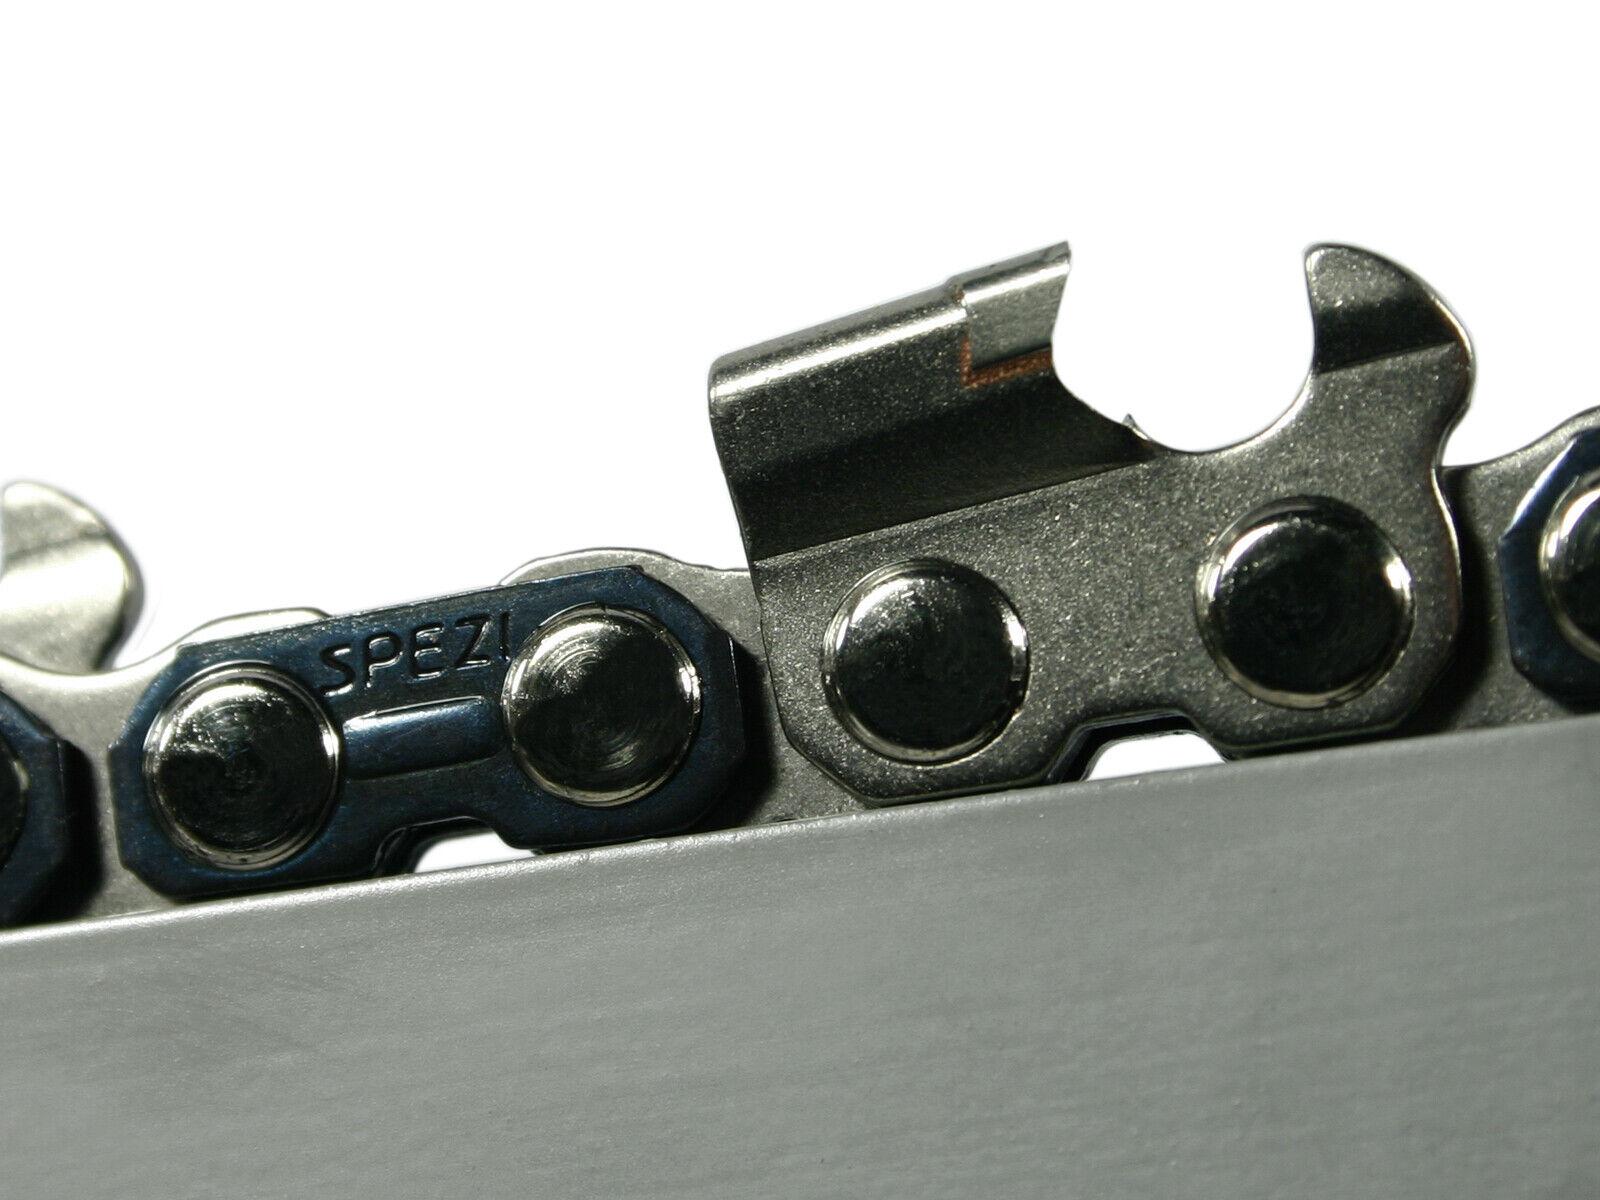 Metal duro cadena sierra adecuado para Husqvarna 394 60 cm 3 8  84 TG 1,5 mm Cochebide